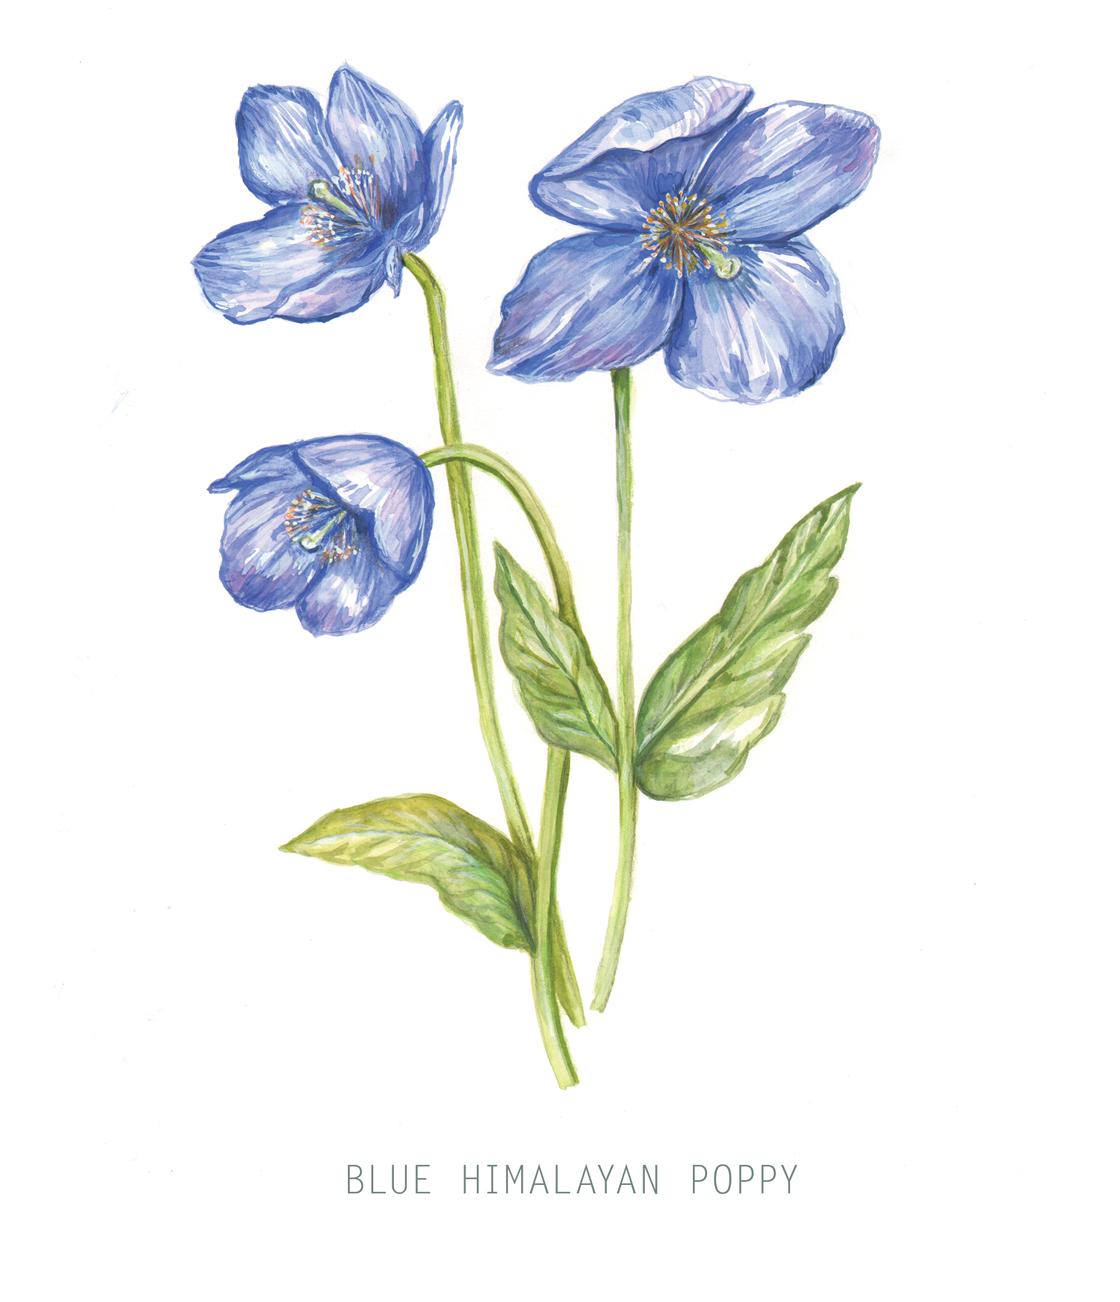 Blue Himalayan Poppy Illustration